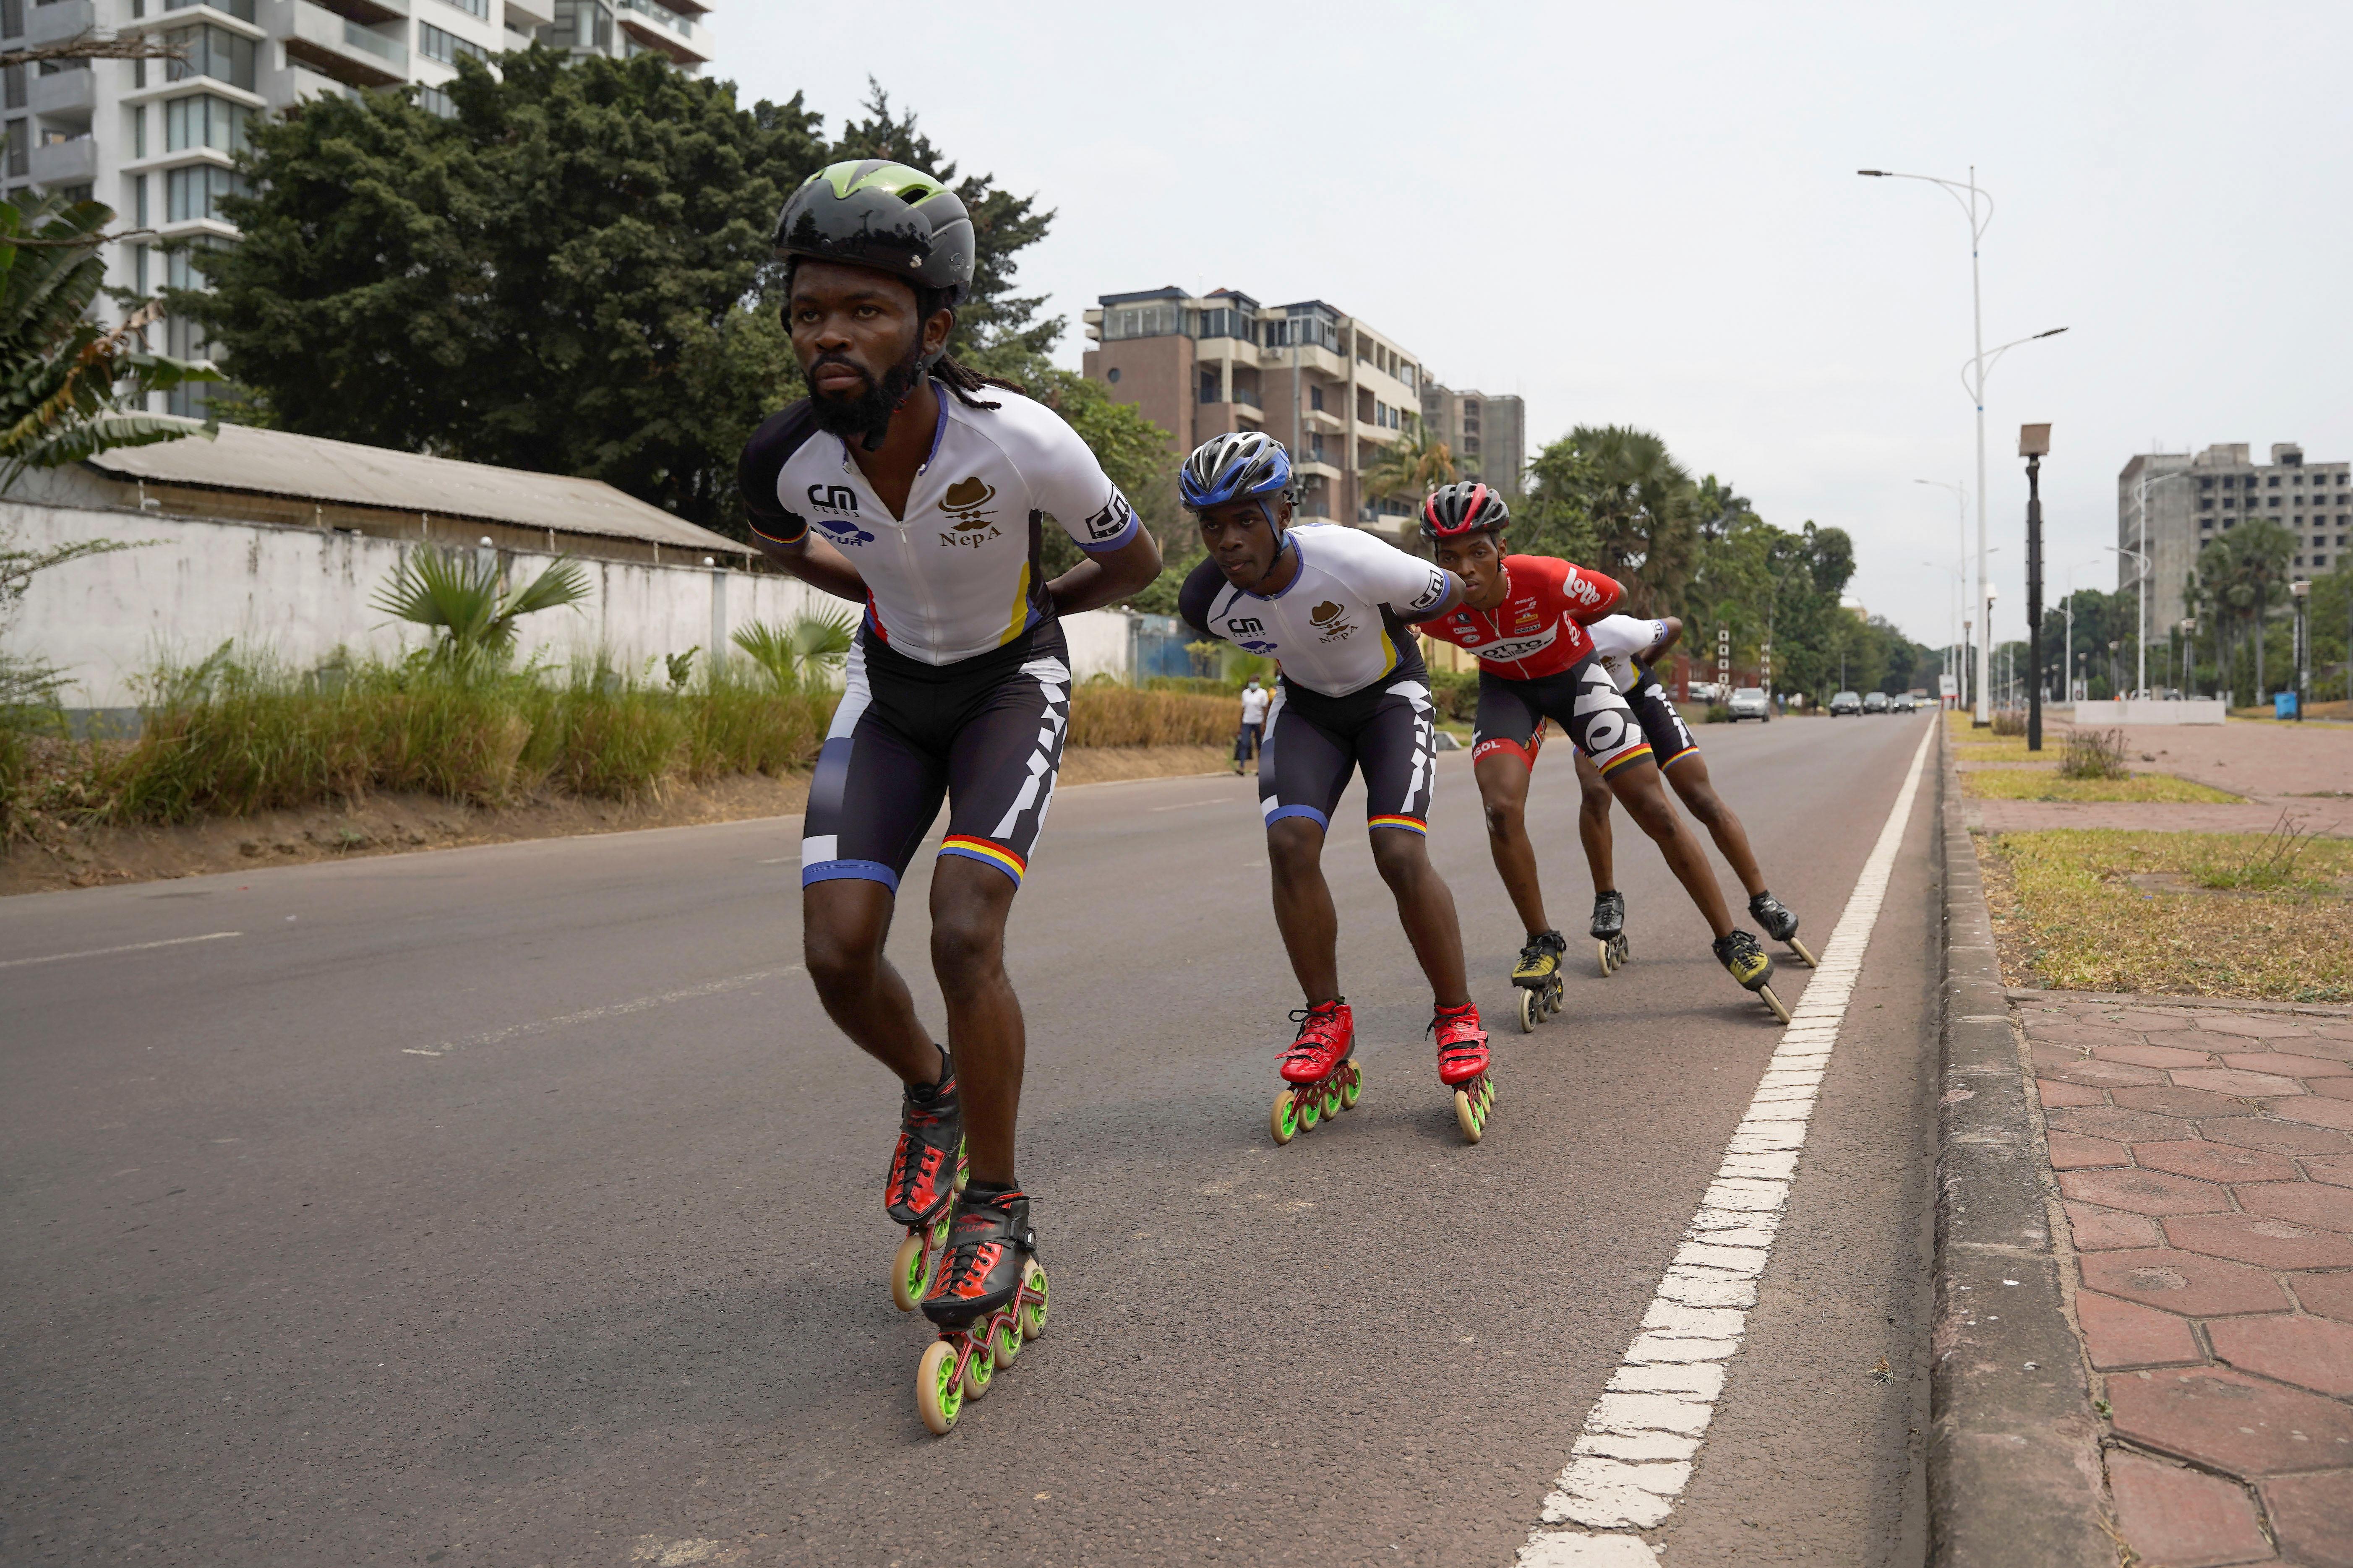 Serge Makolo leads his speed skating teammates during a training in Kinshasa, Democratic Republic of Congo, September 16, 2021. REUTERS/Hereward Holland